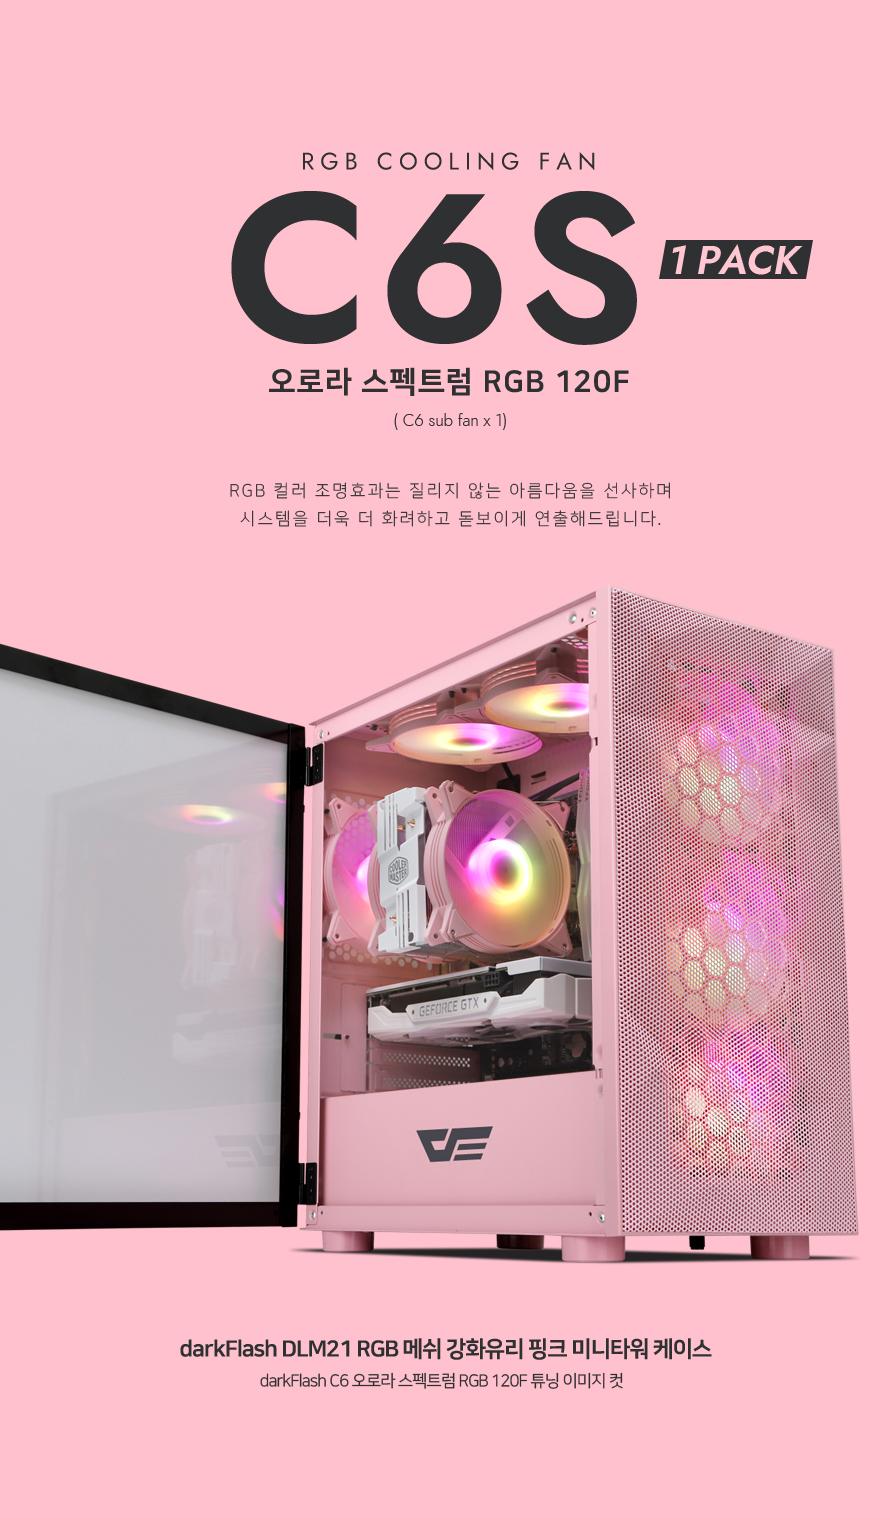 darkFlash  C6S RGB(핑크 1PACK)